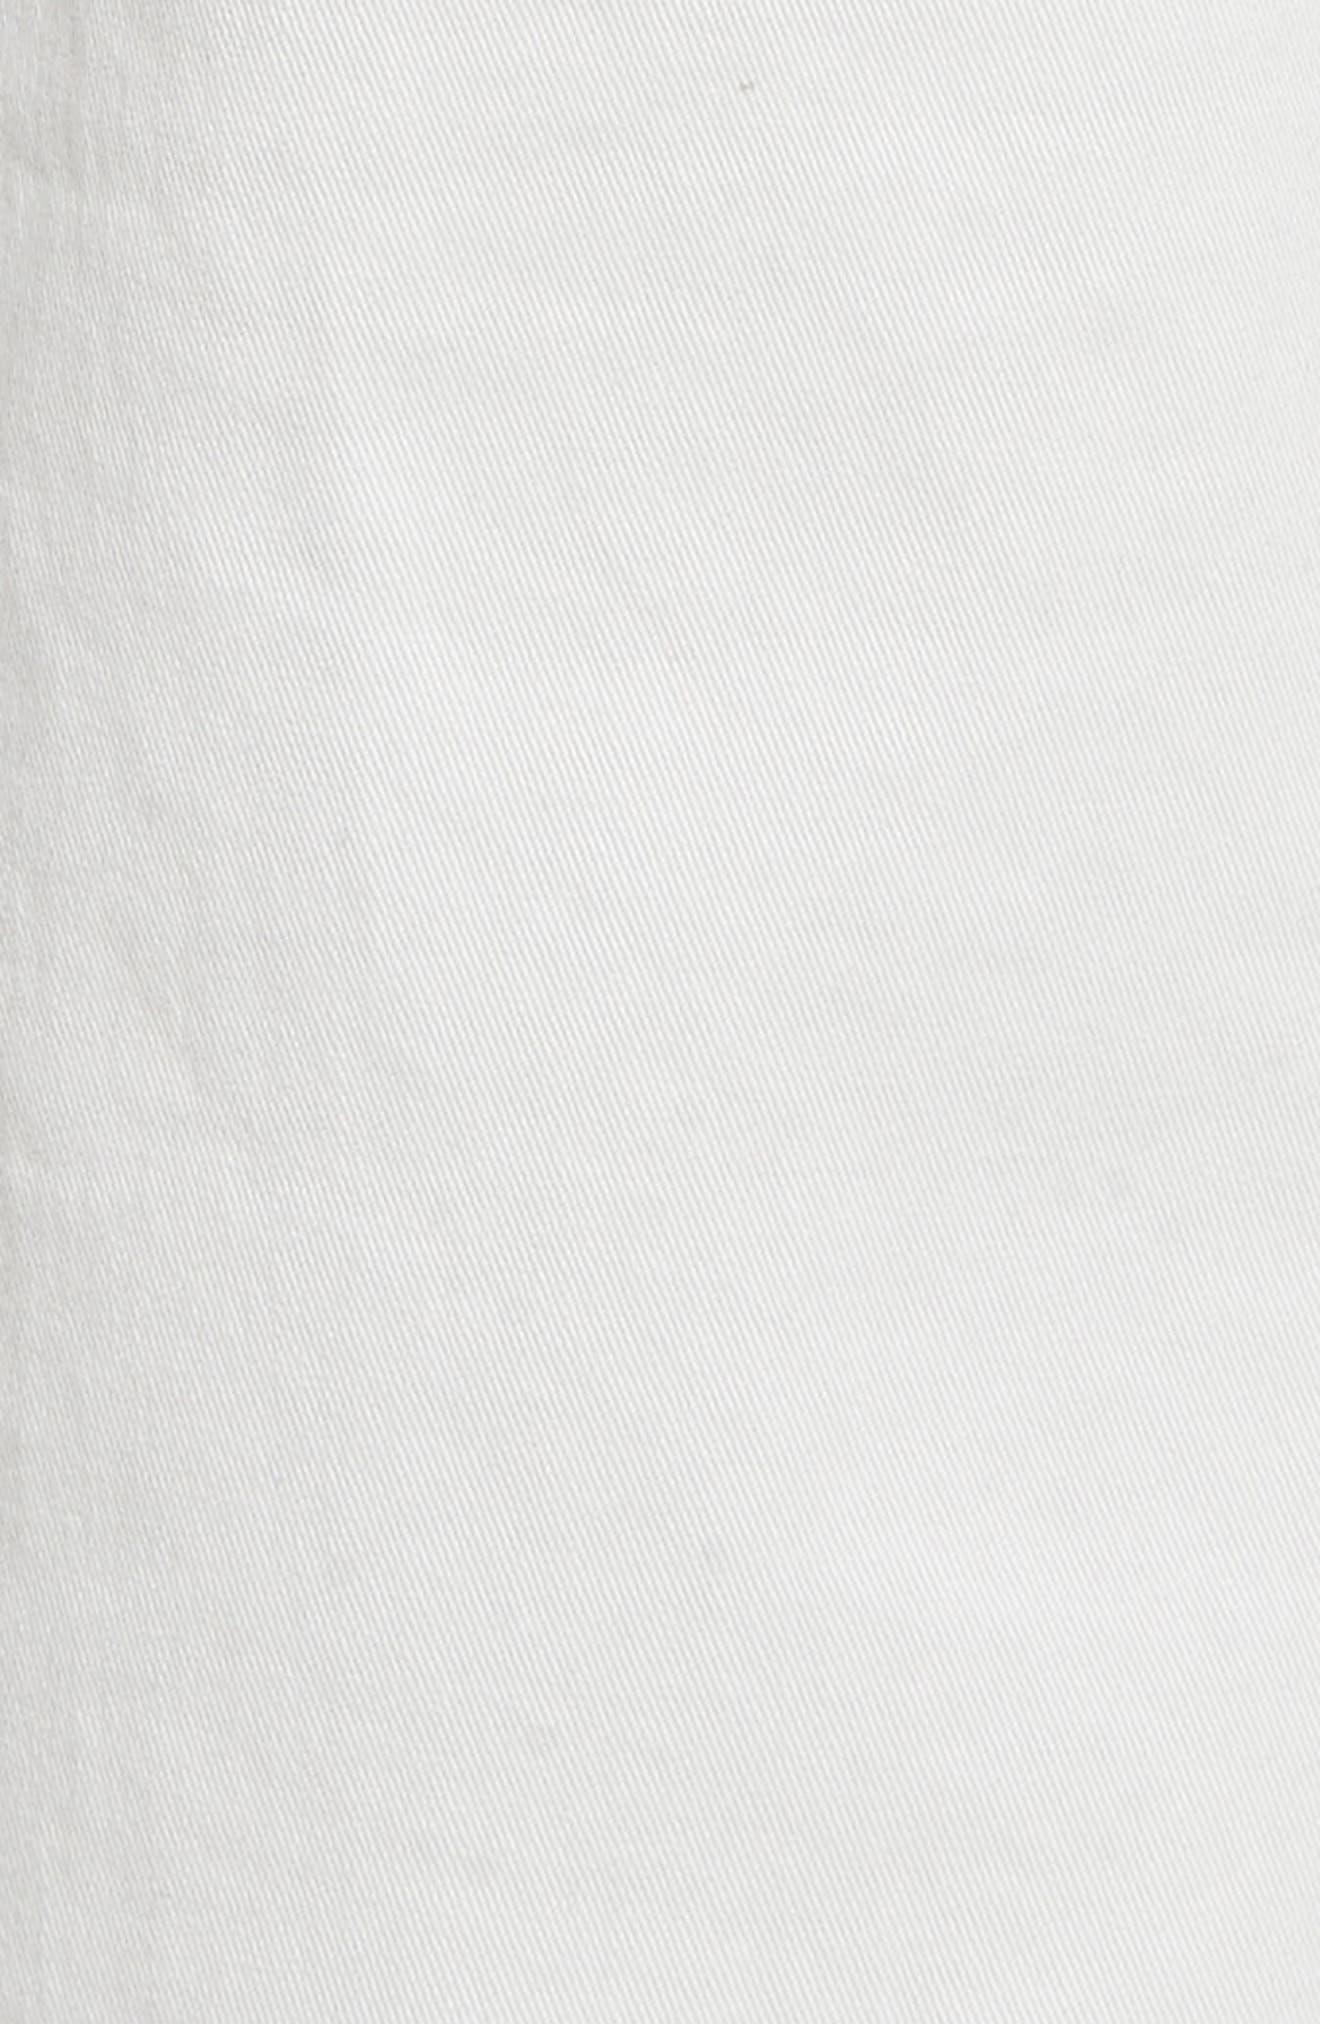 The Graduate Trousers,                             Alternate thumbnail 5, color,                             023